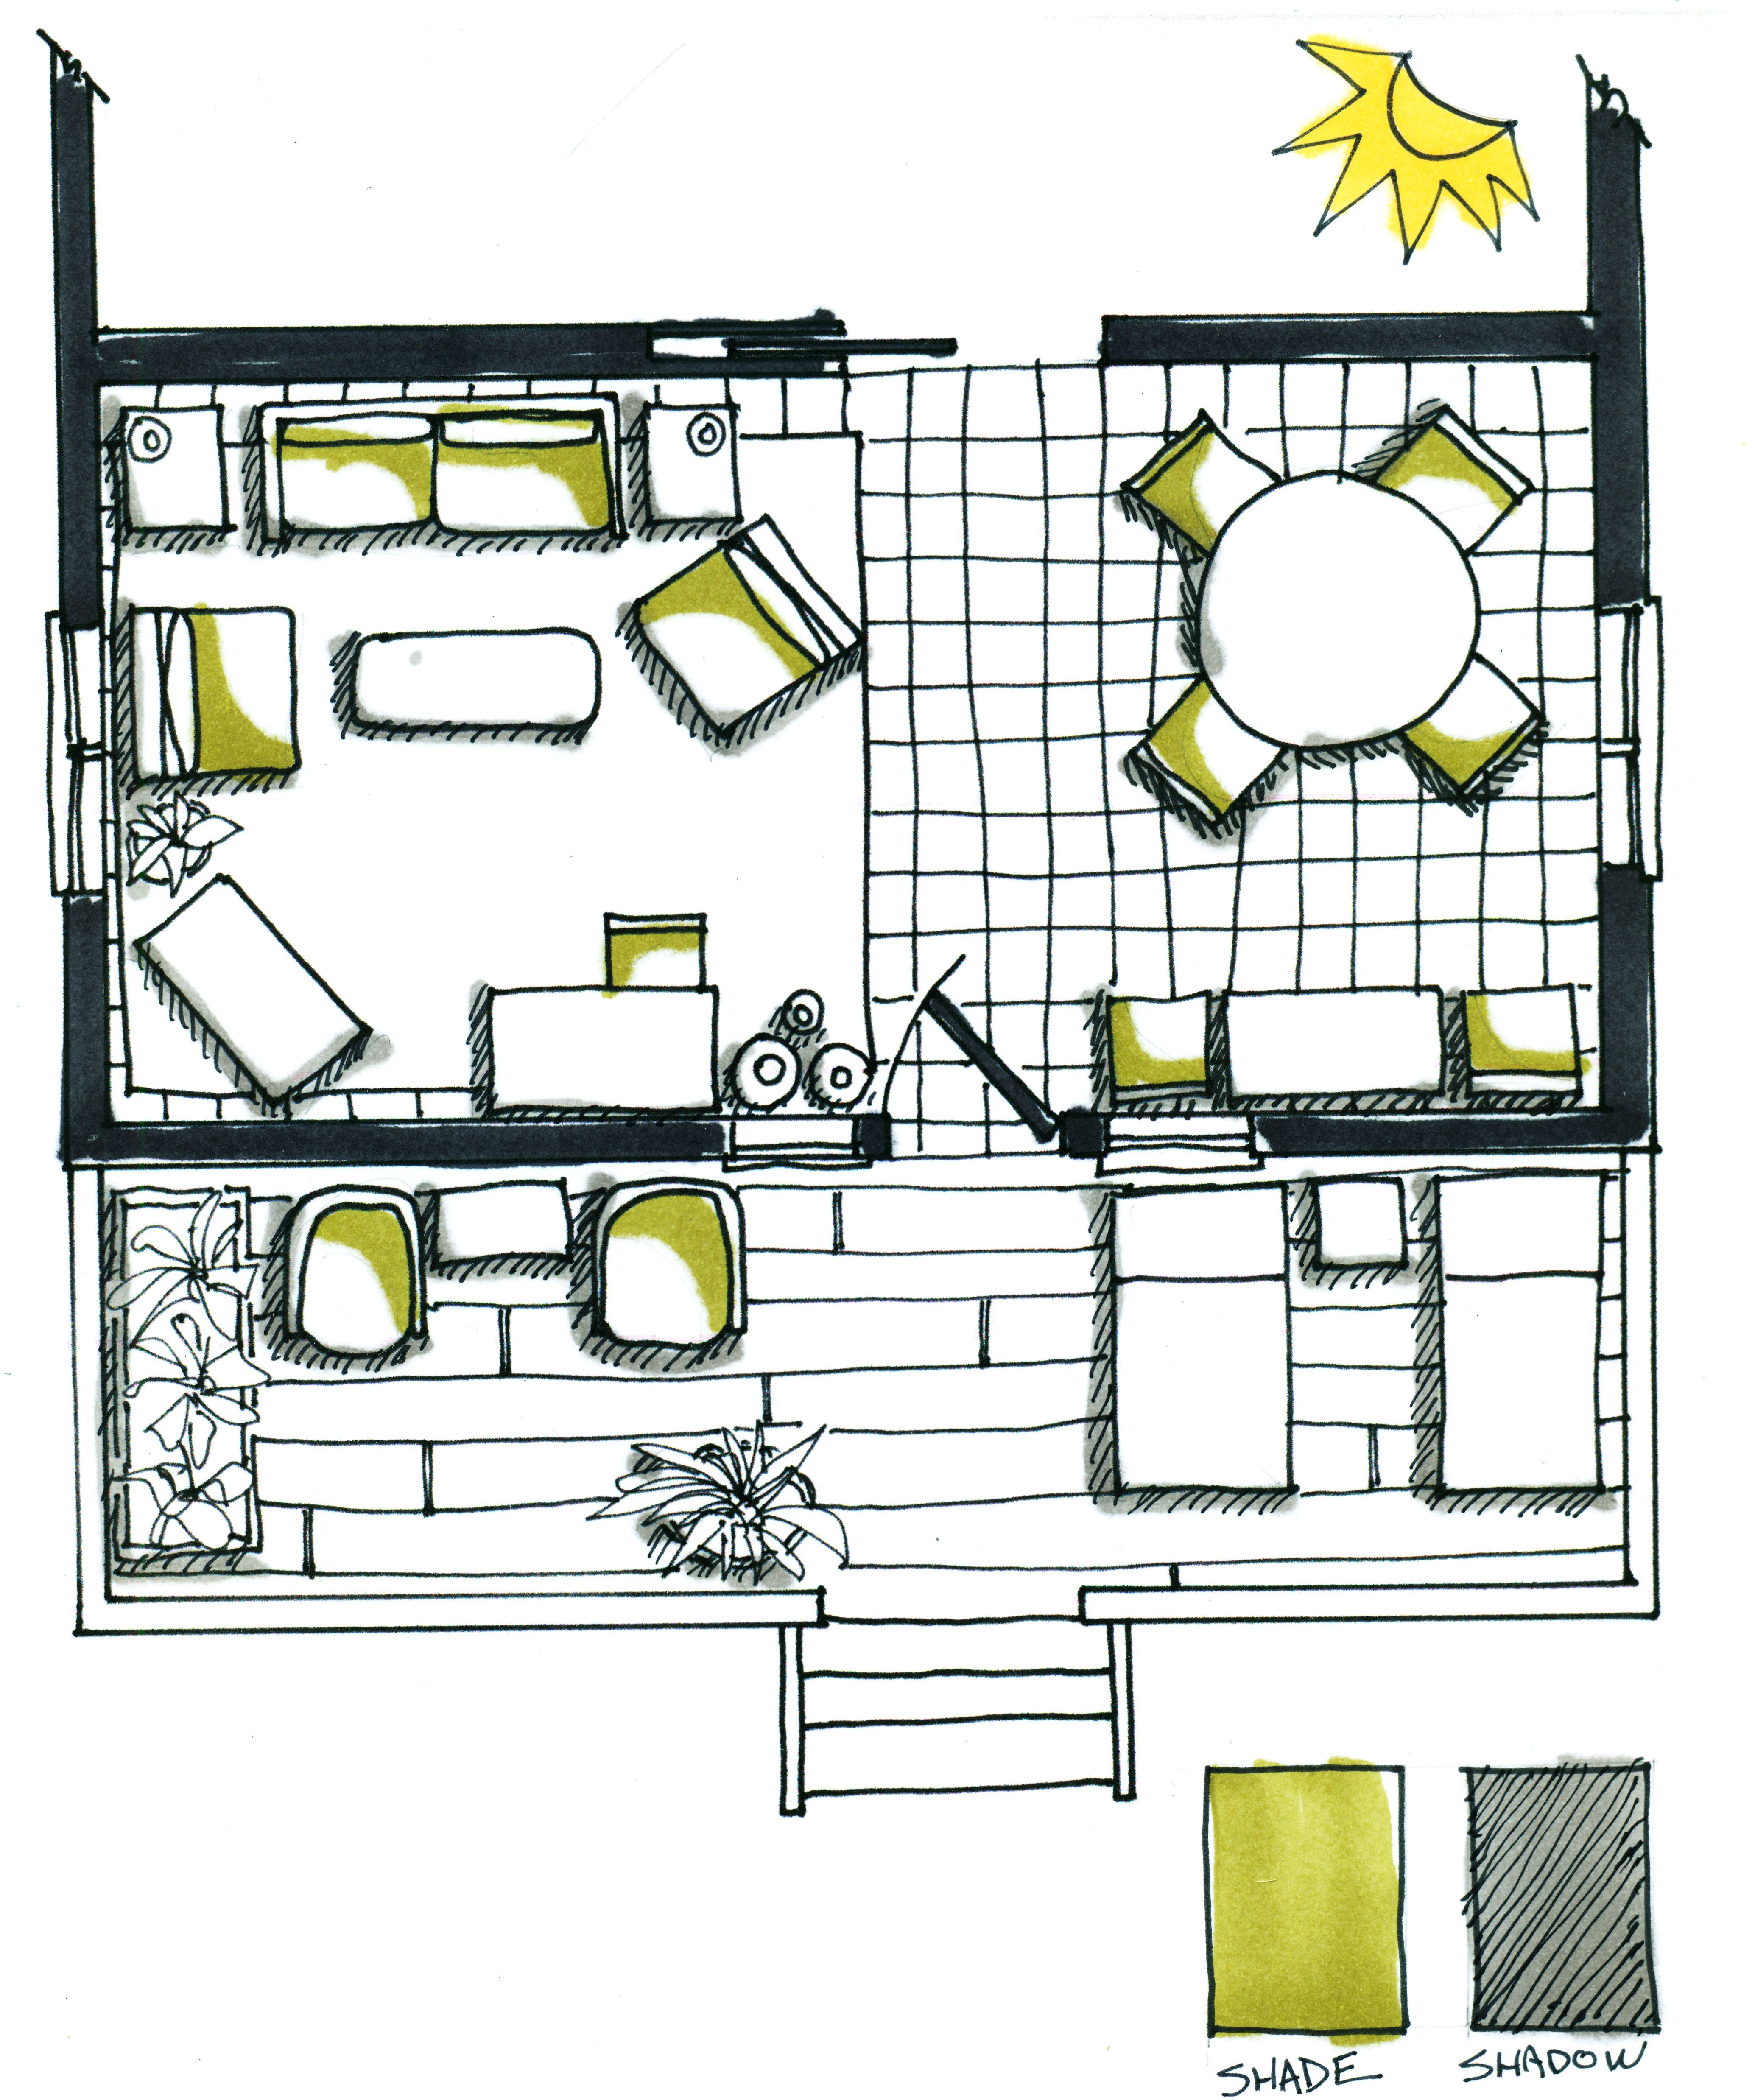 Floor plan shade & shadow | Rendered floor plan, Interior ...